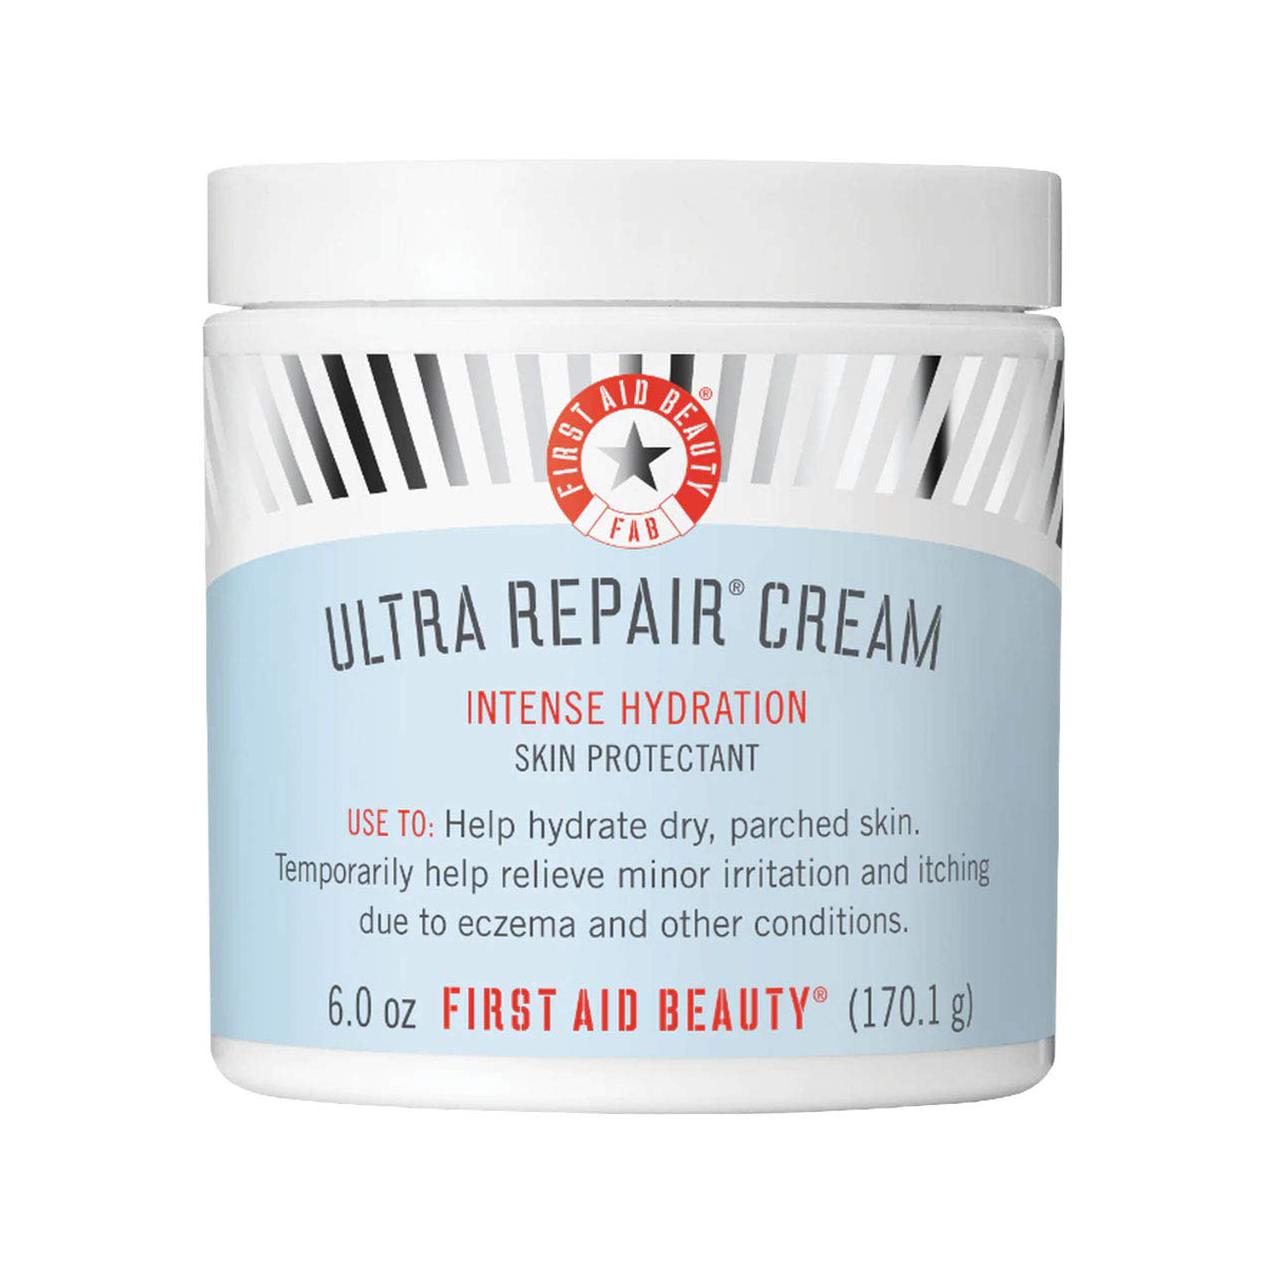 first aid beauty sensitive sensitized skin